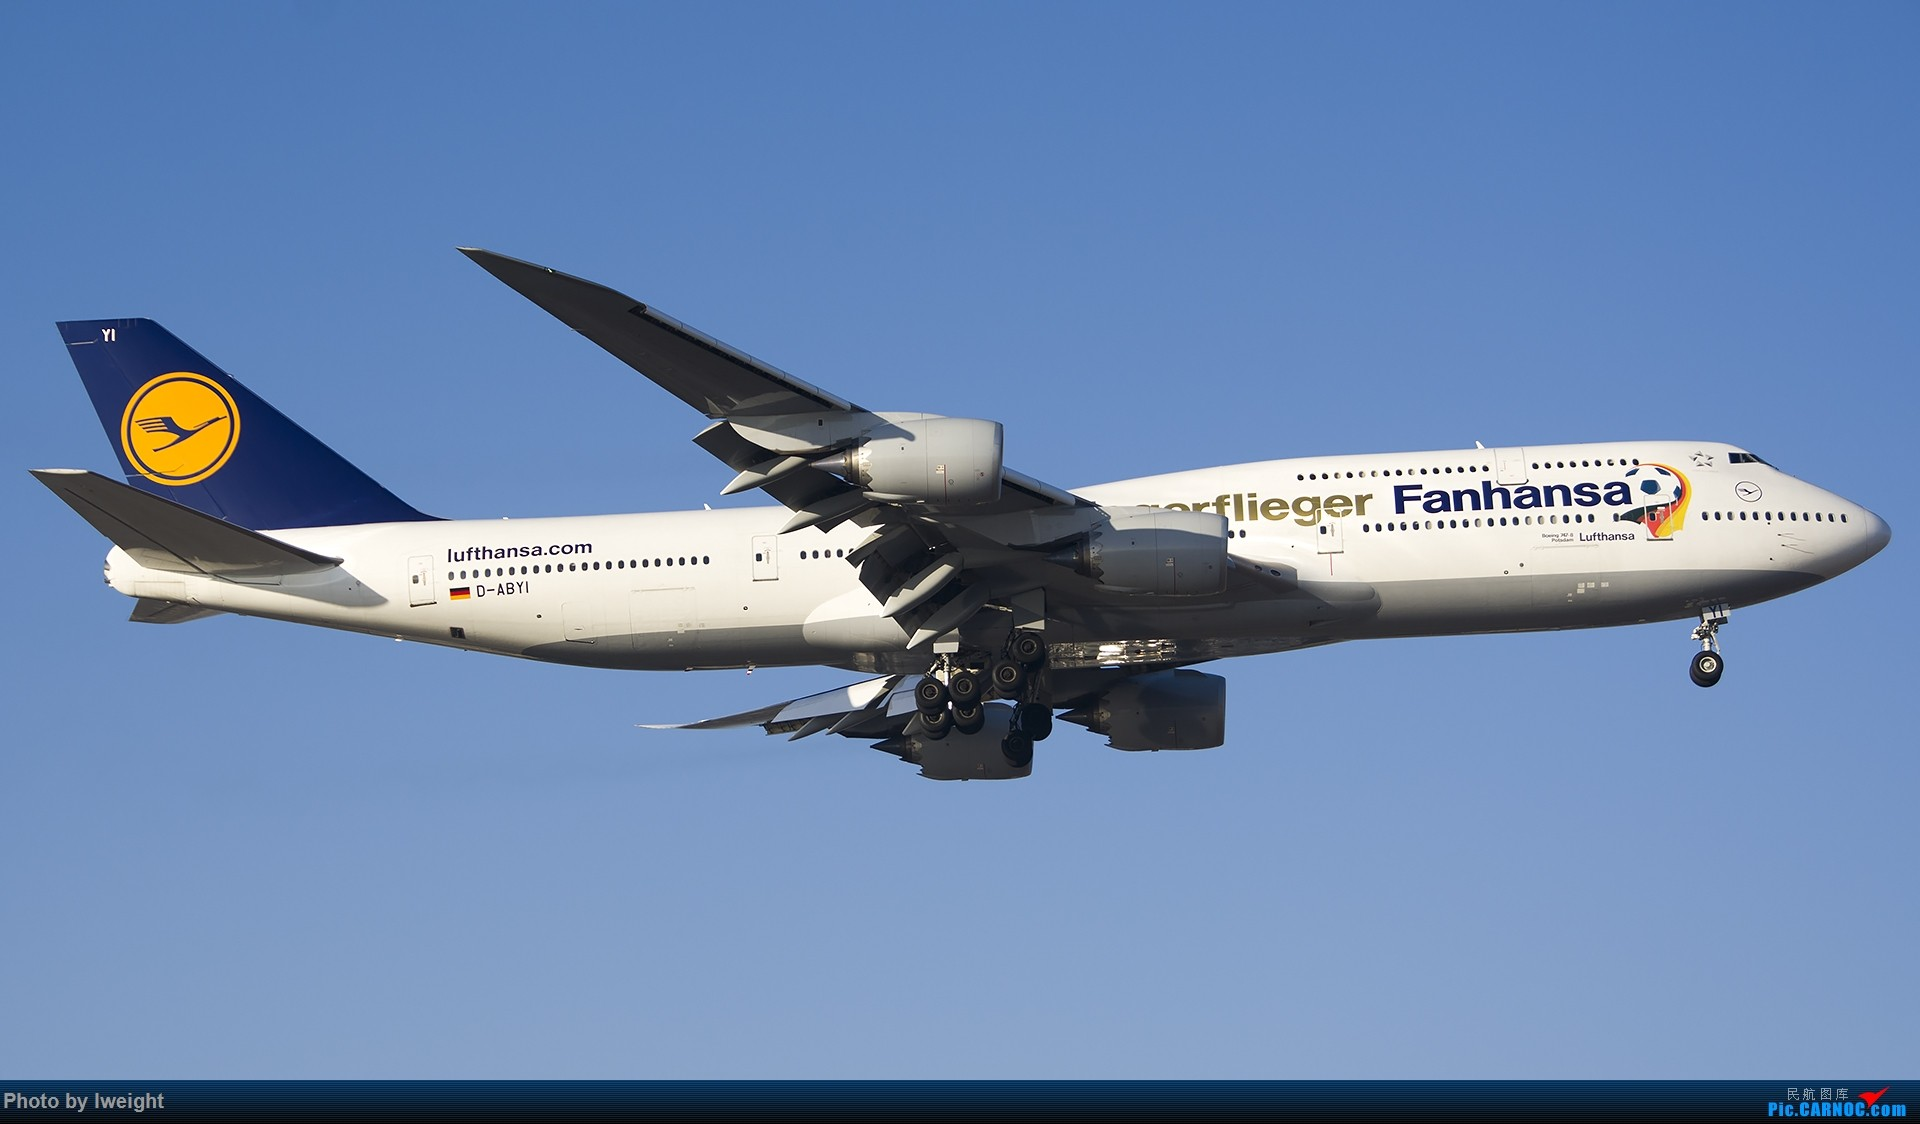 Re:[原创]庆祝升级777,发上今天在首都机场拍的所有飞机【2014-12-14】 BOEING 747-8I D-ABYI 中国北京首都国际机场